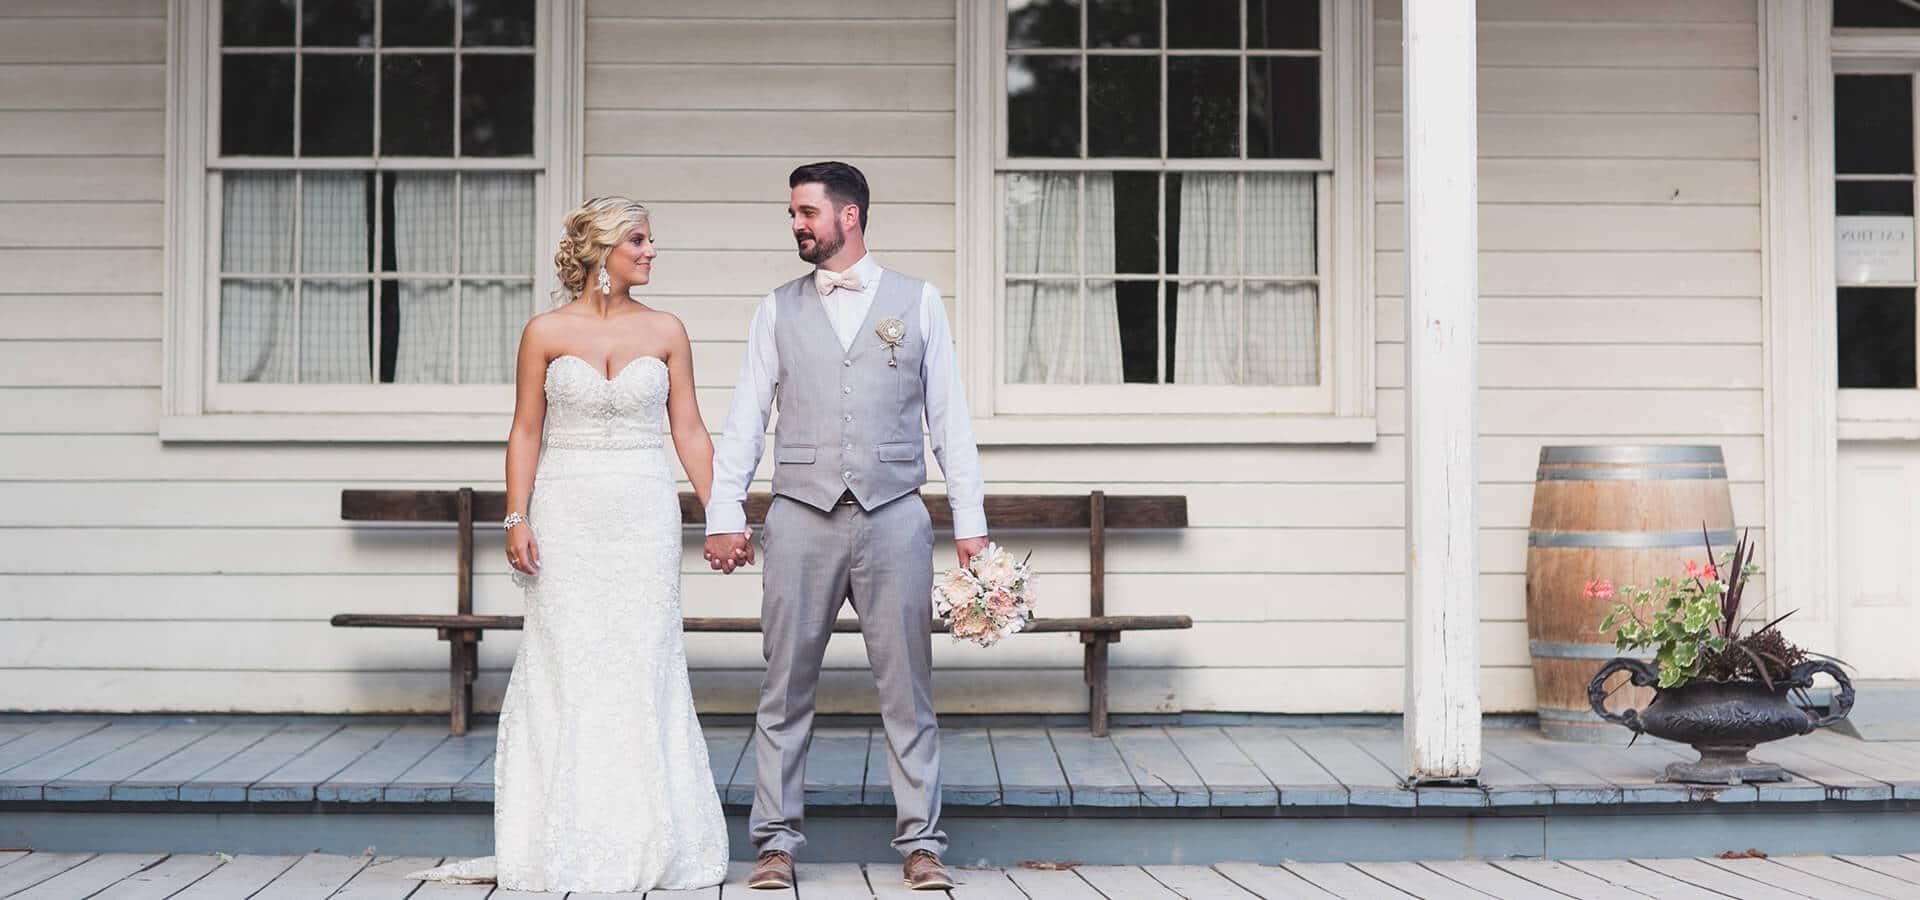 Hero image for Shannon & Danny's Romantic Vintage Wedding at Black Creek Pioneer Village